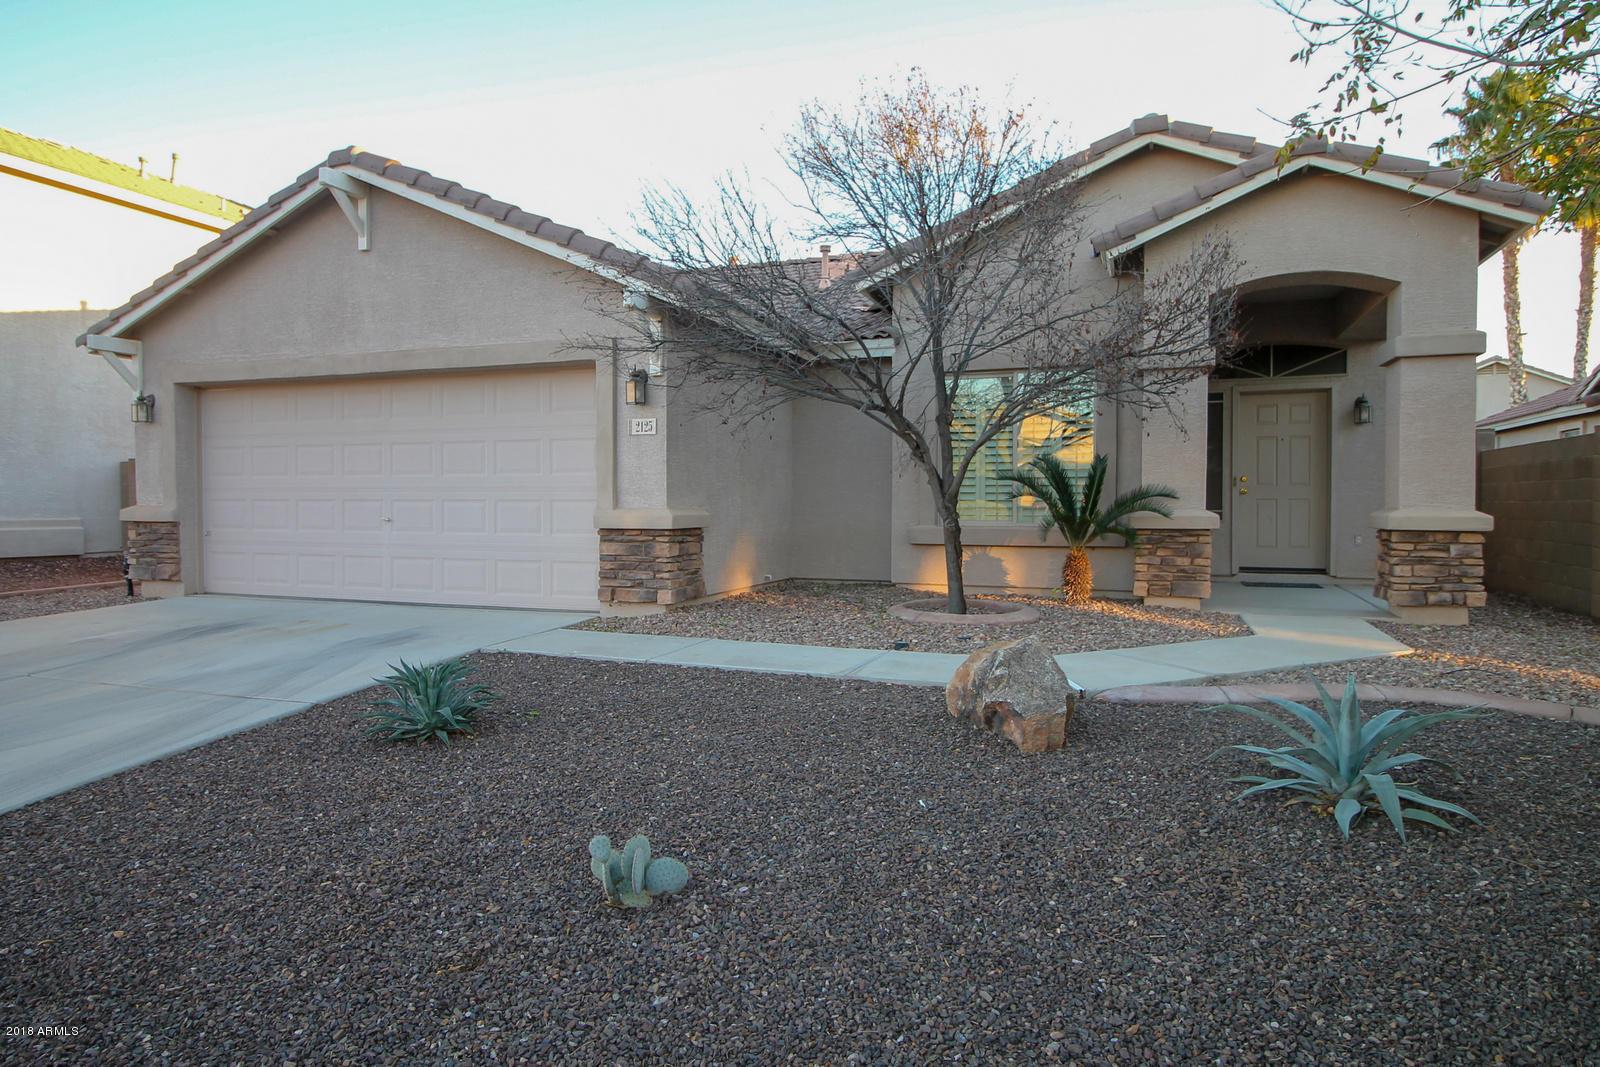 Photo of 2125 W GOLDMINE MOUNTAIN Drive, Queen Creek, AZ 85142